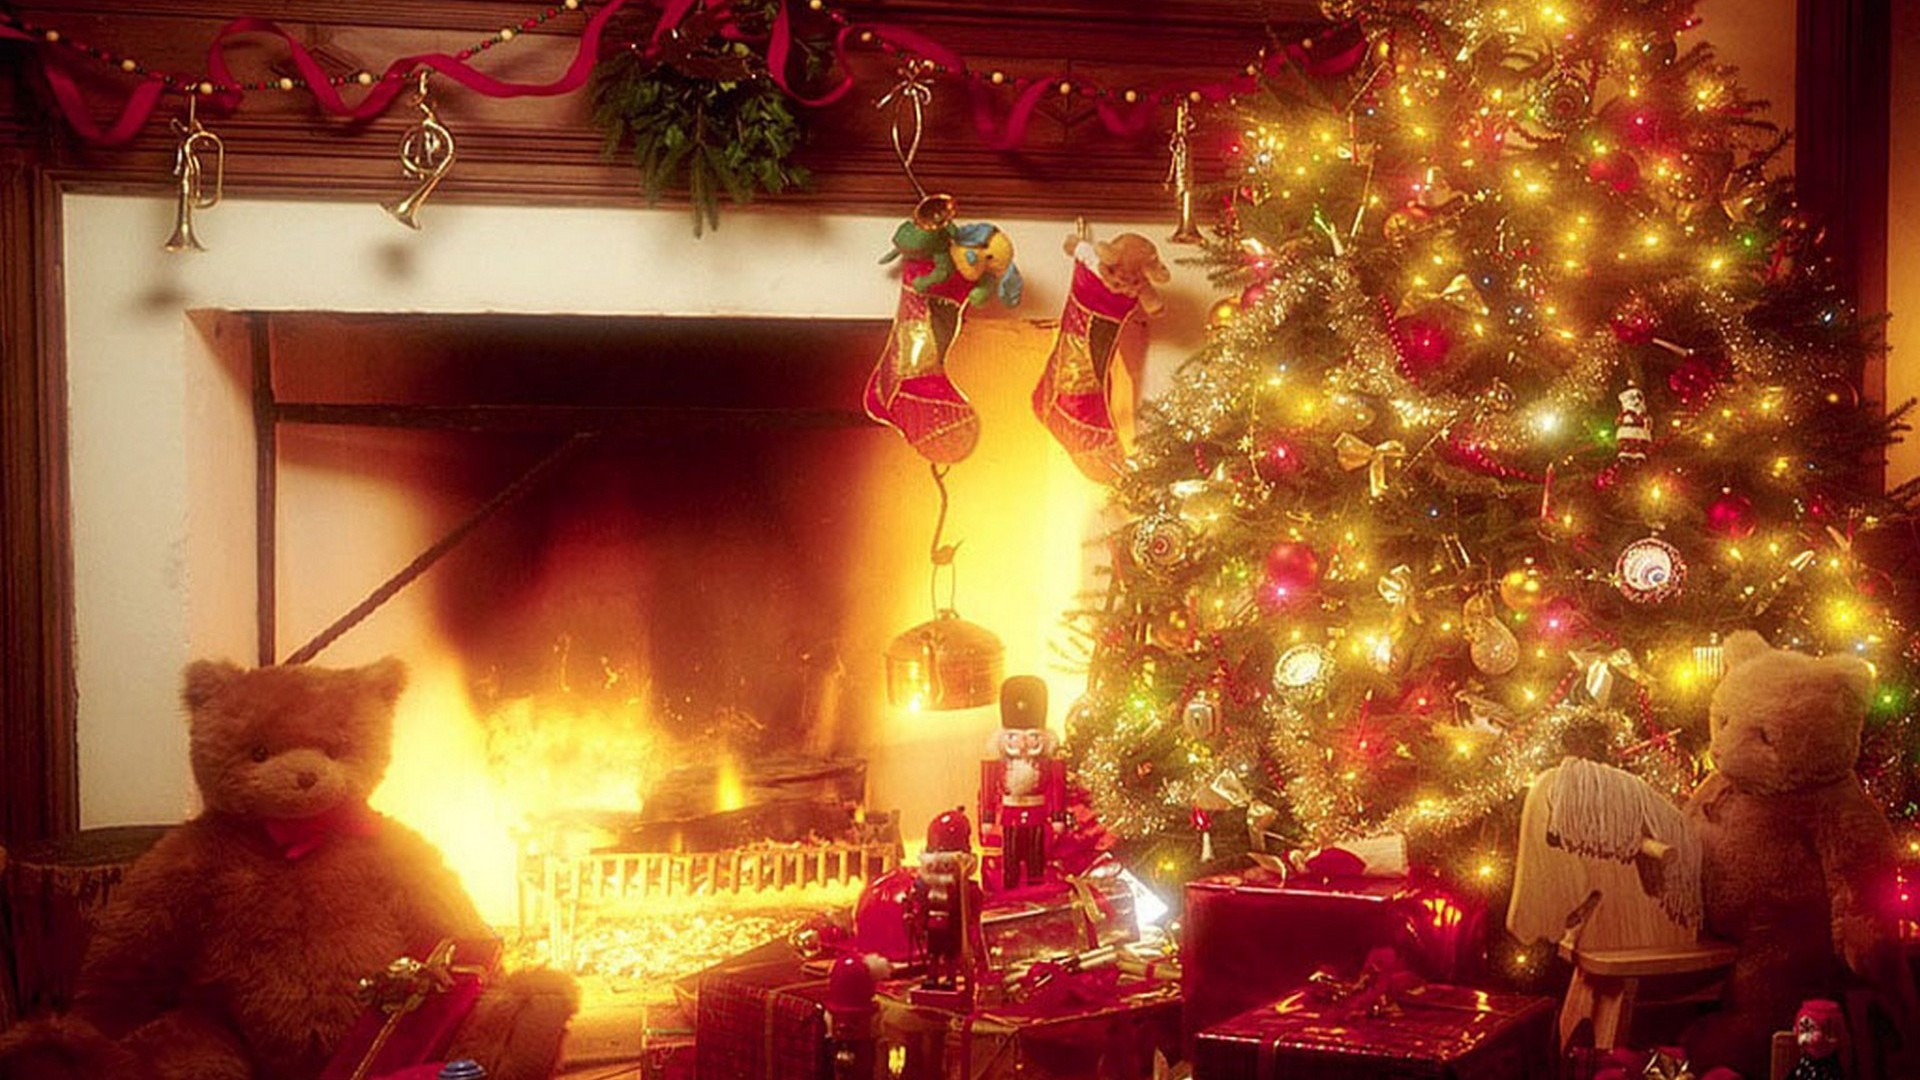 Winter Christmas Desktop Backgrounds – Wallpaper HD Base